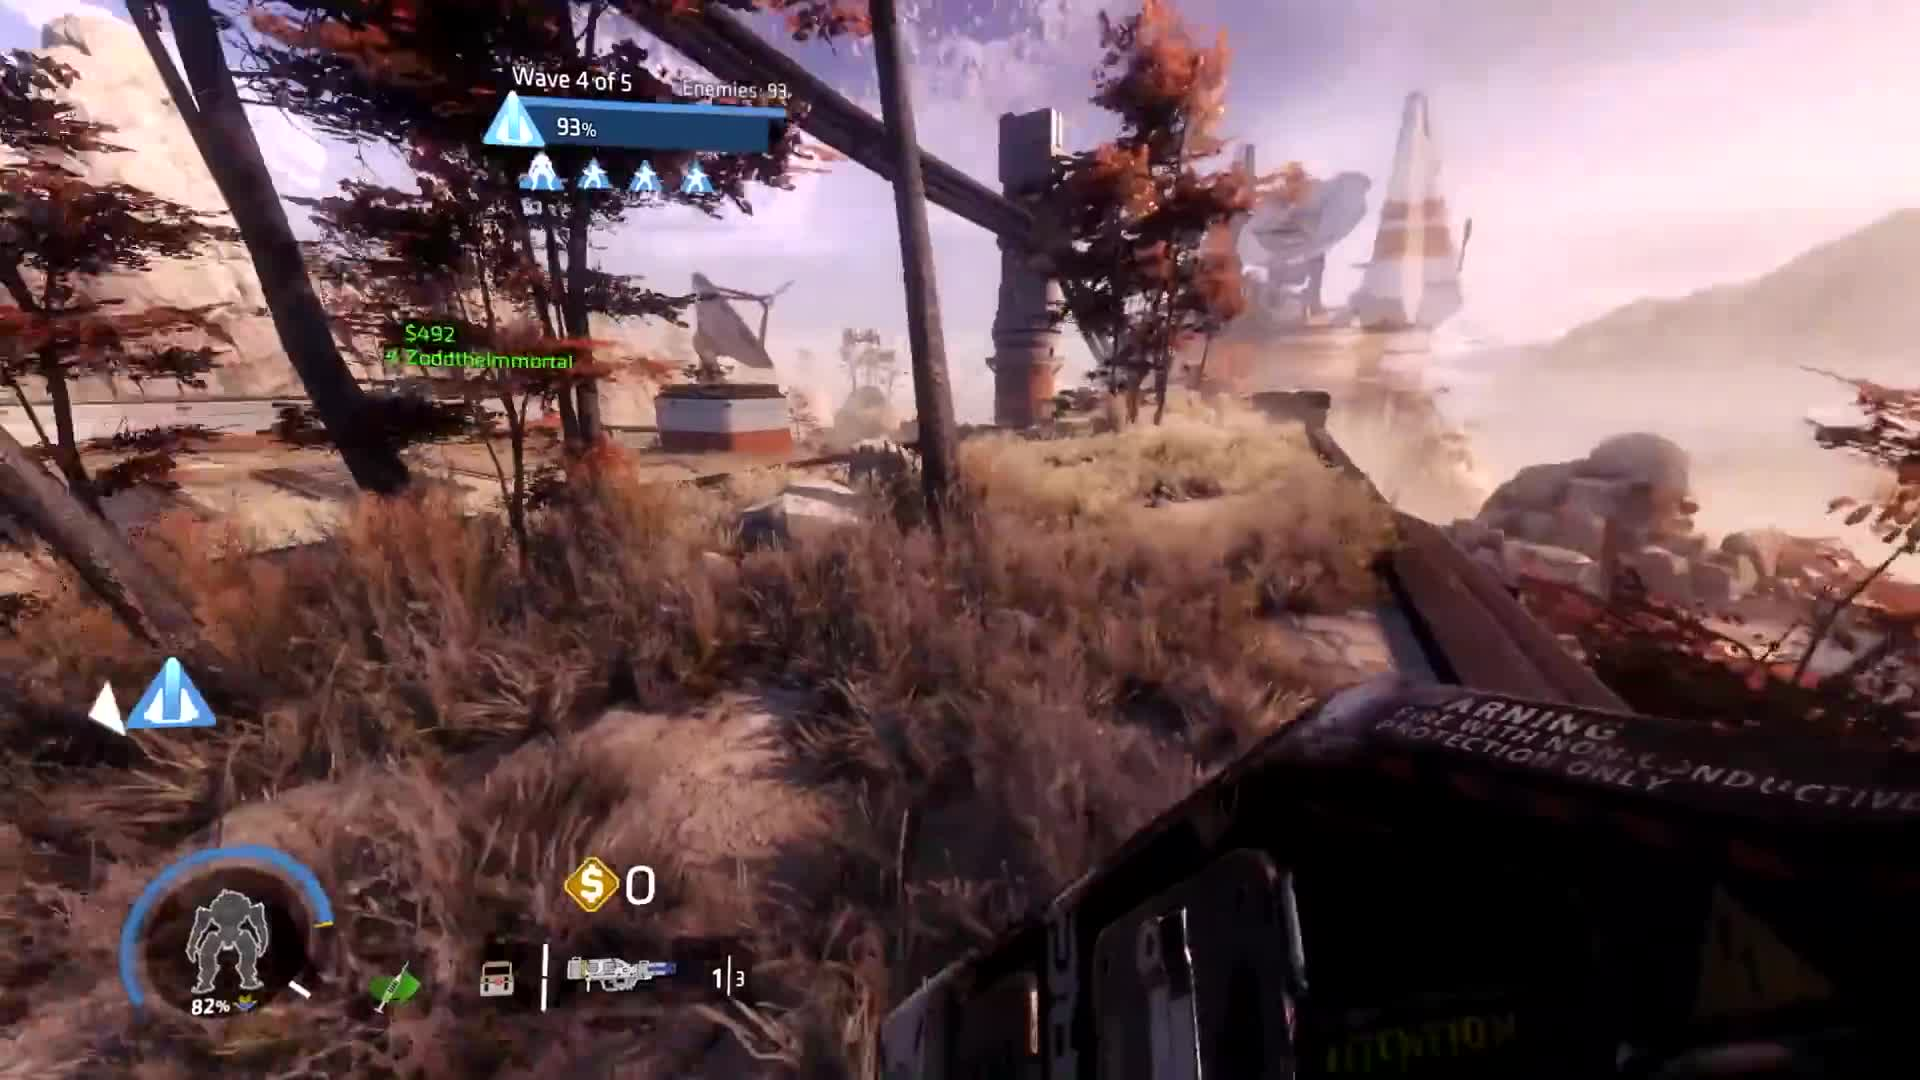 Frontier Defense, Gaming, Insane, Titanfall 2, Vaughny, Titanfall GIFs